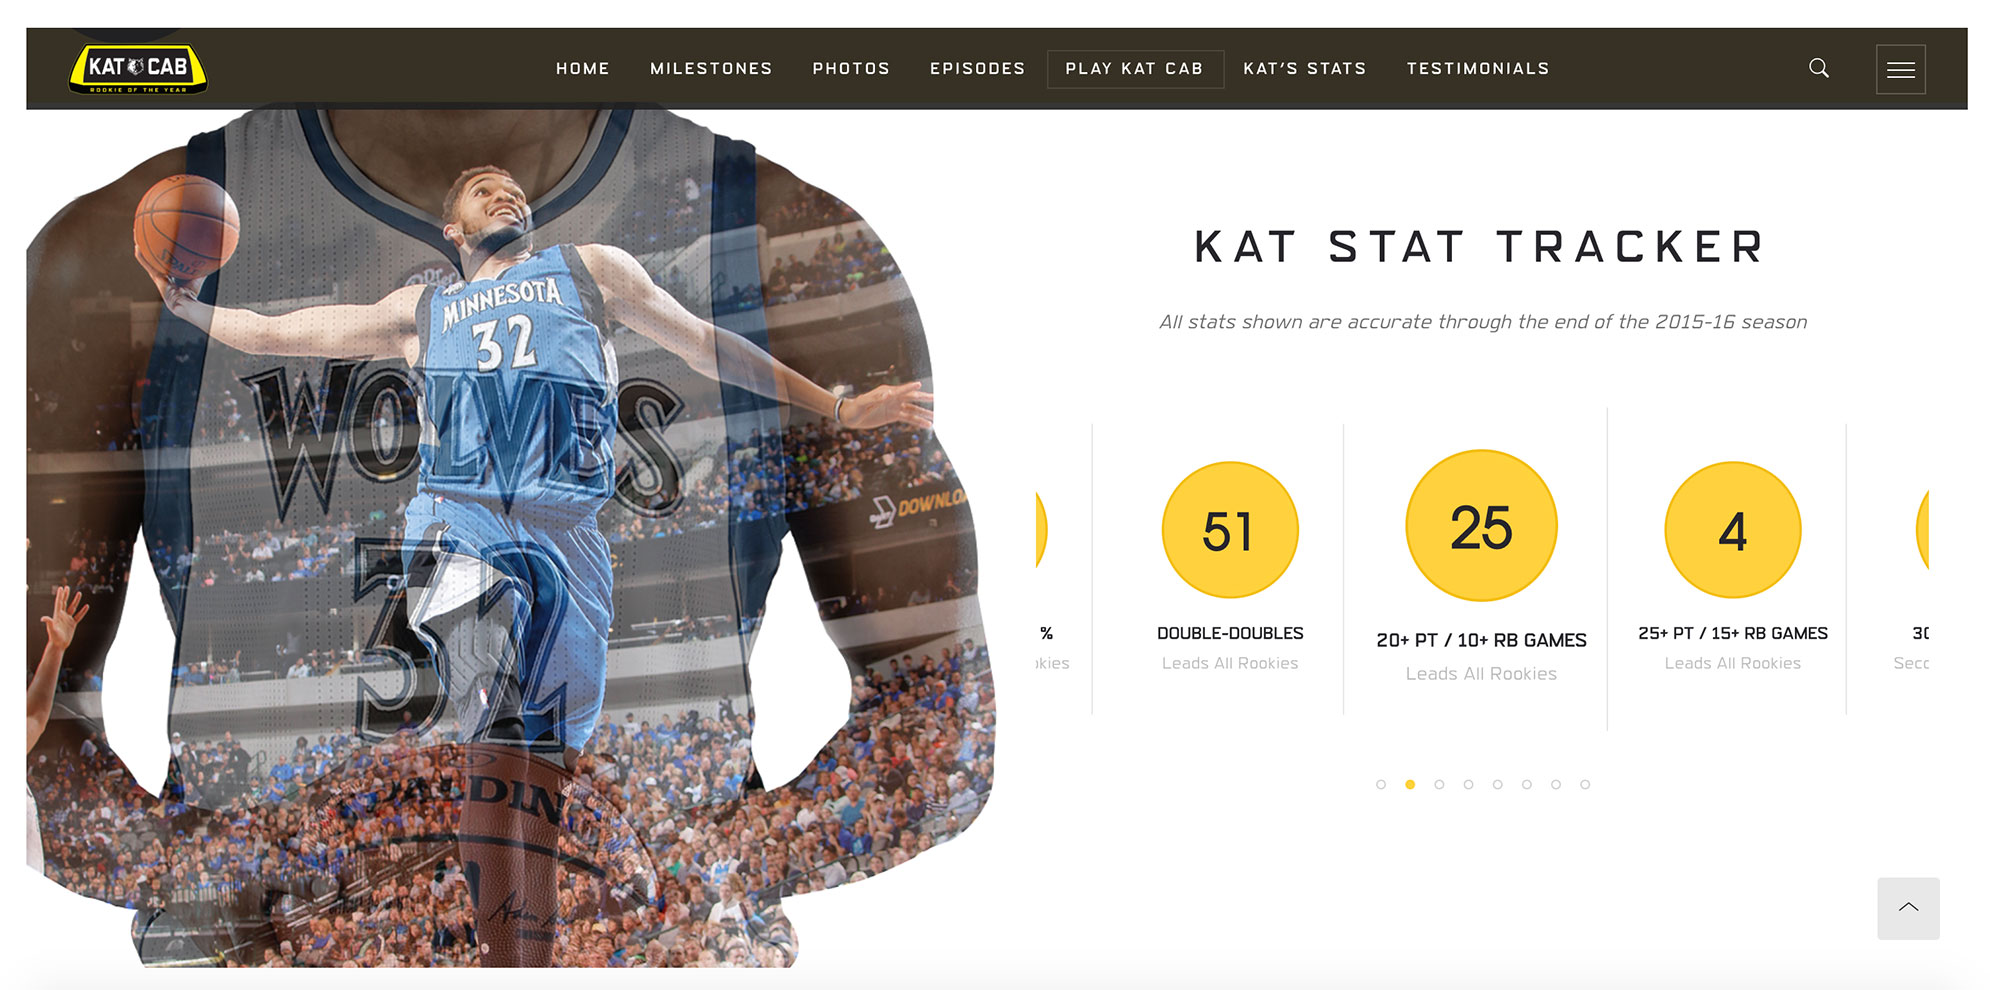 Kat Cab Stat Tracker Spot, Desktop View